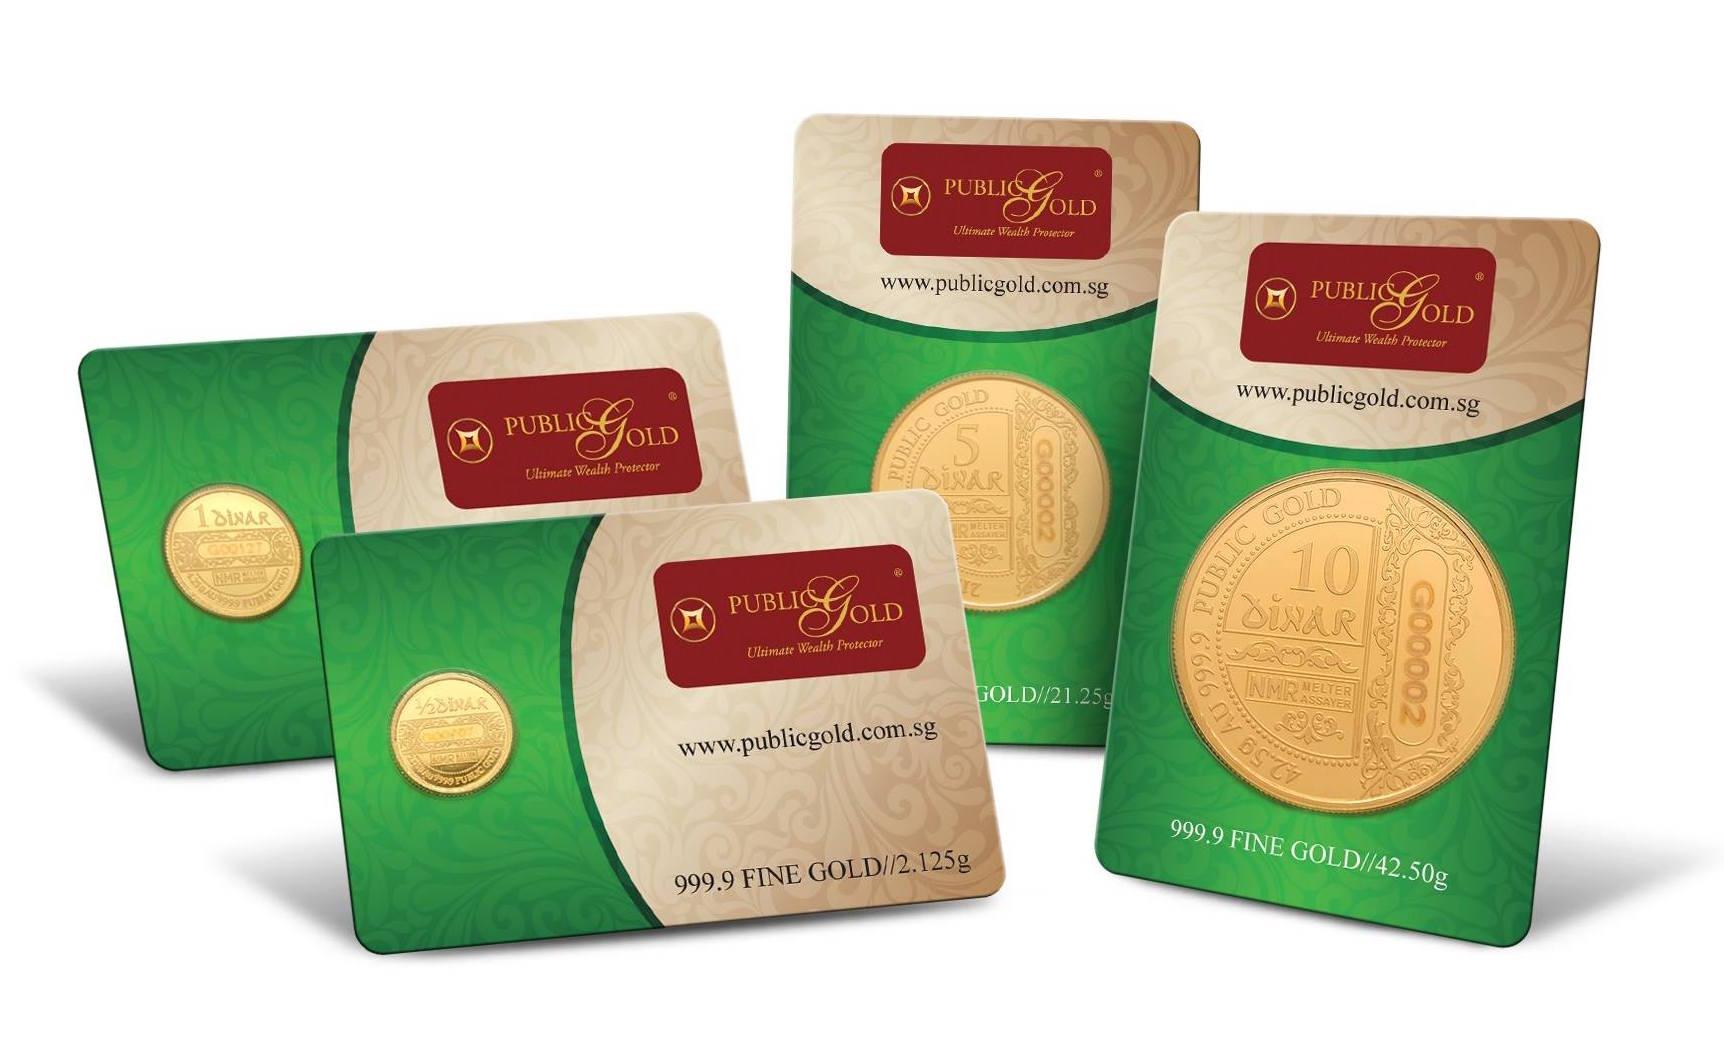 dinar emas 24k 999 public gold